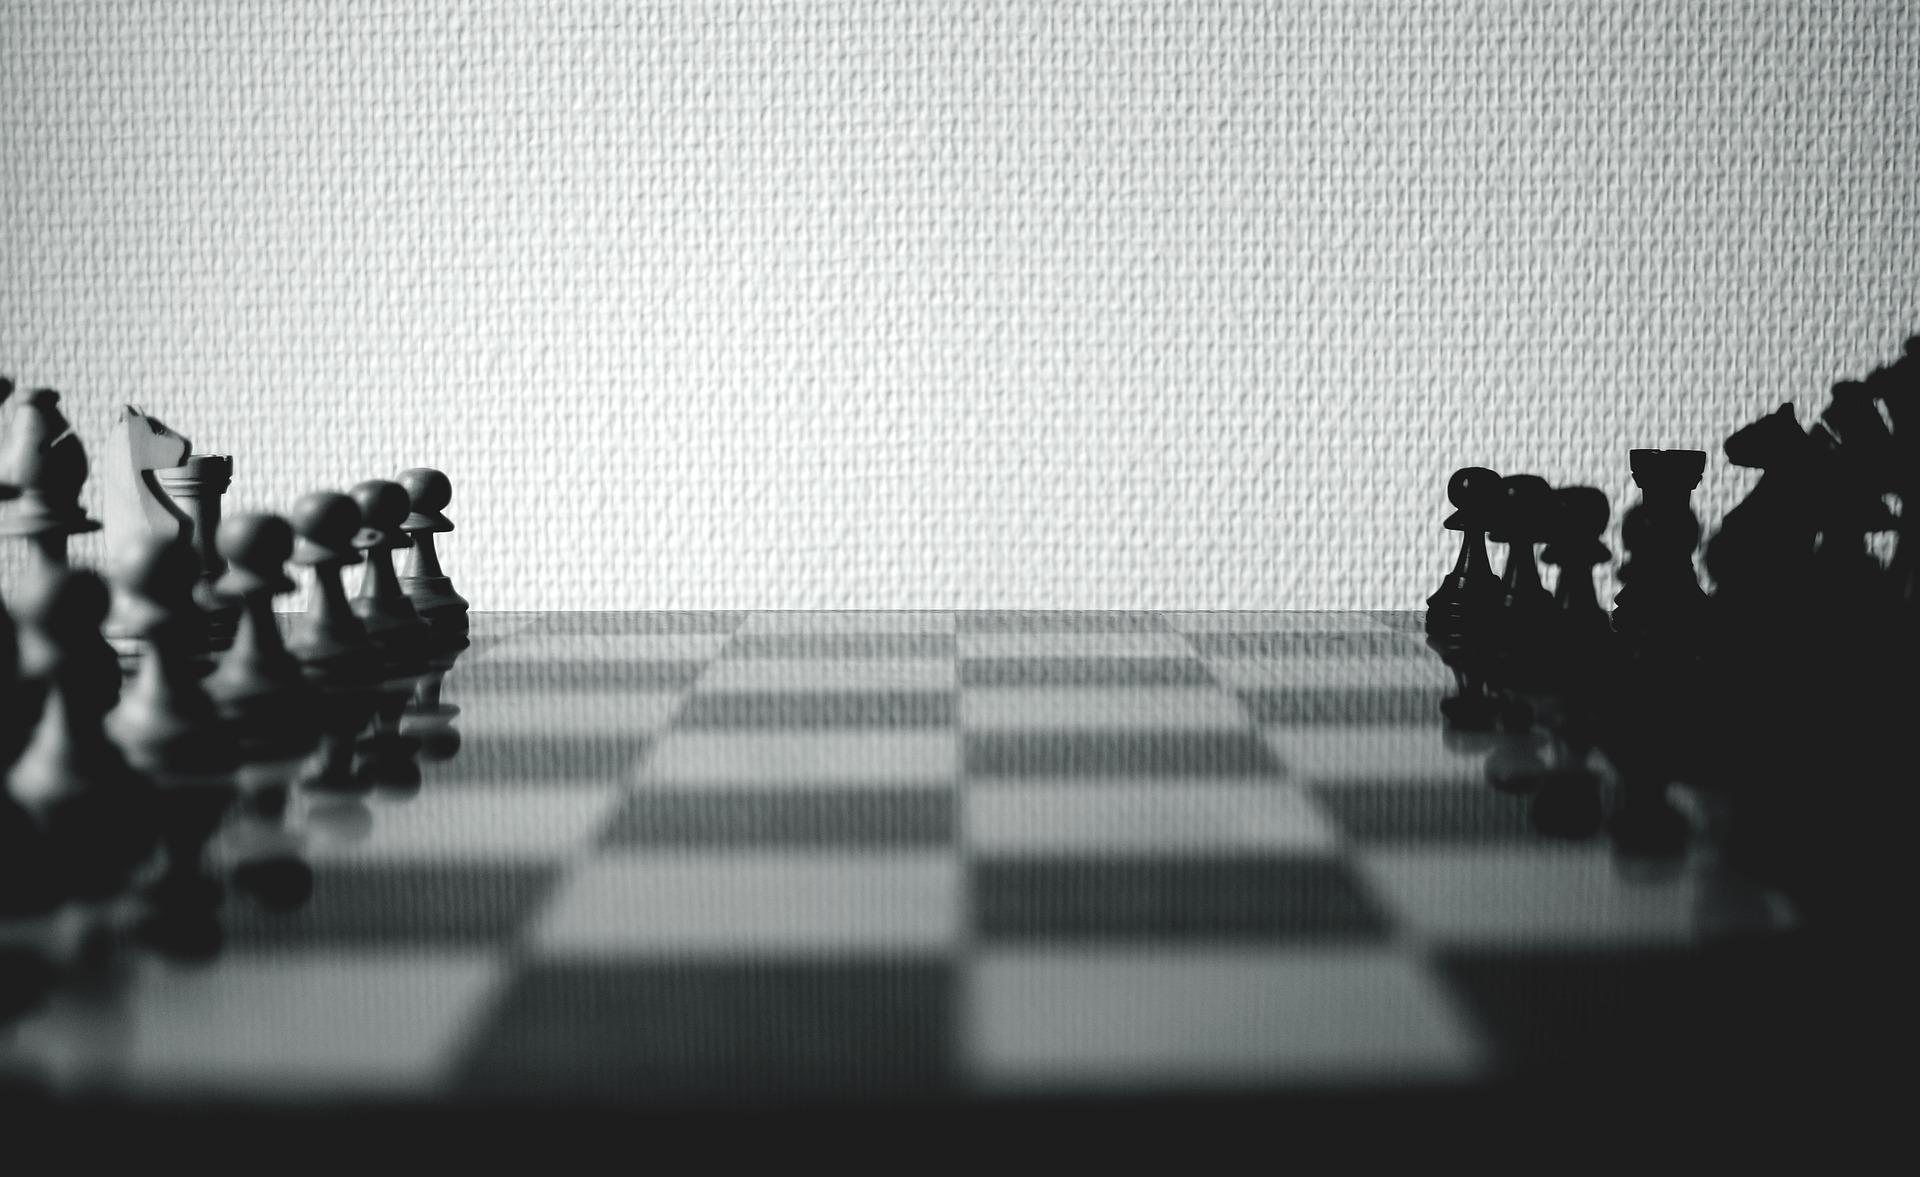 chess-board-1838696_1920